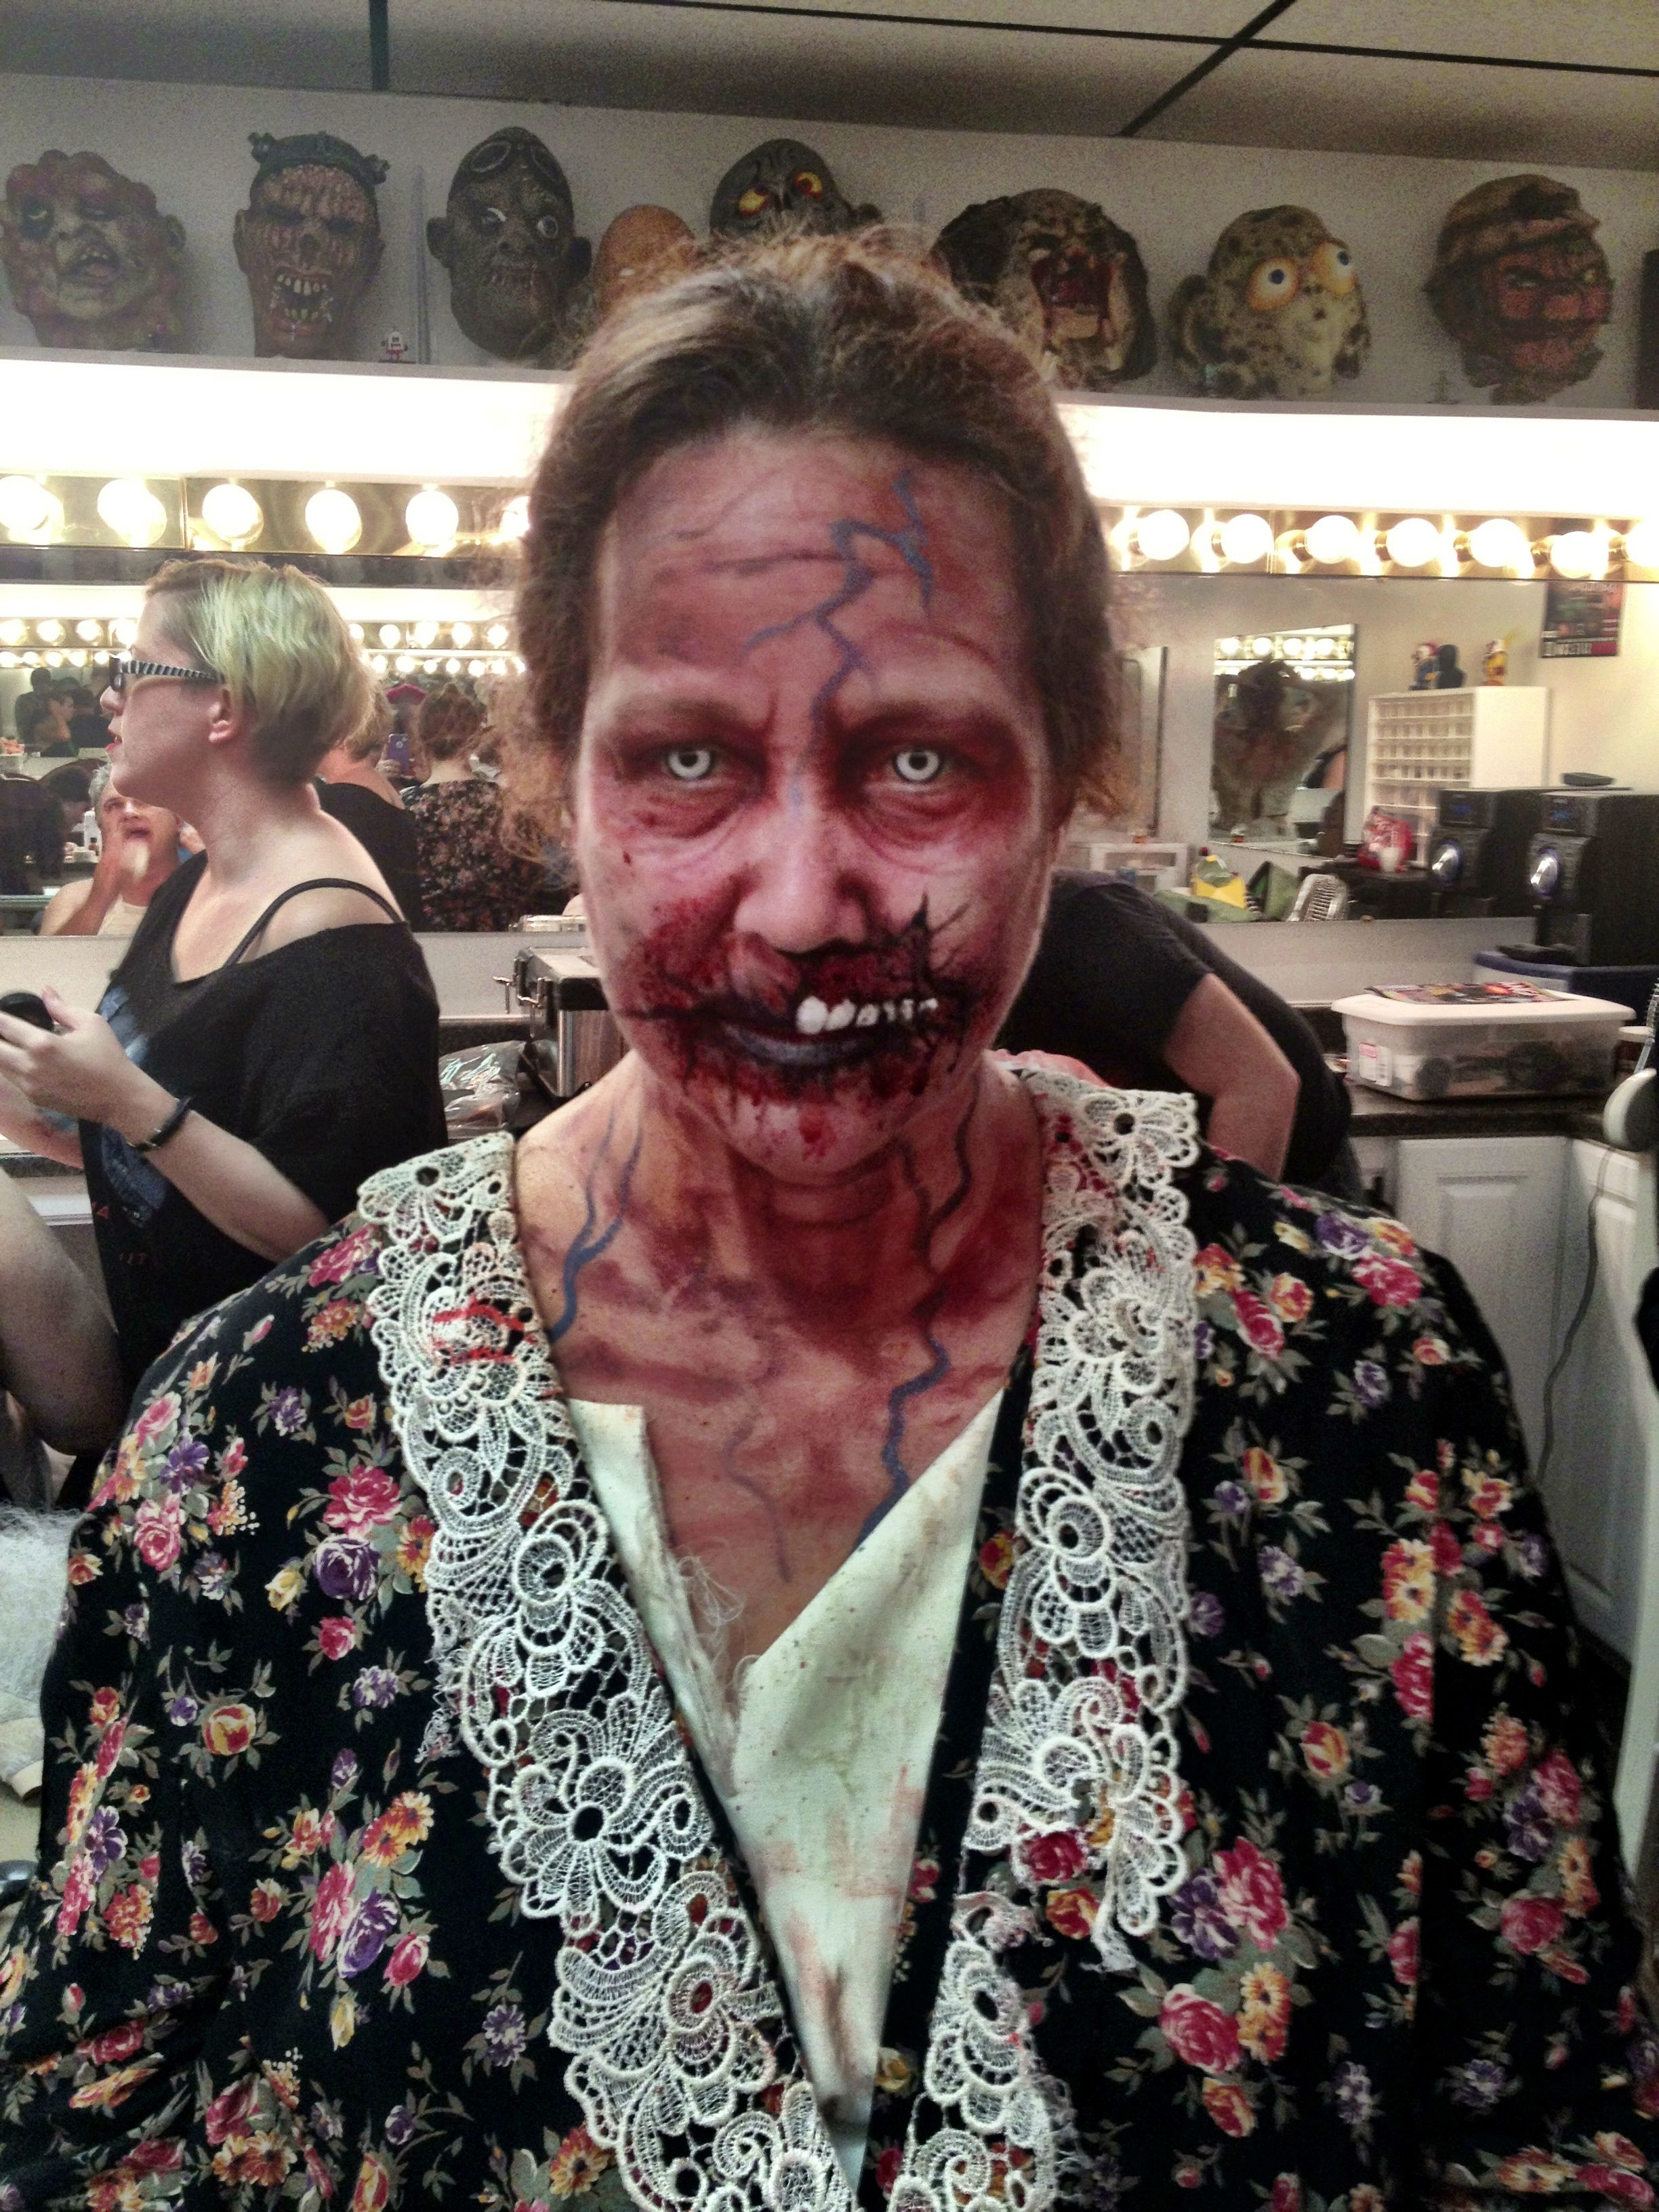 Zombie makeup. The Dent Schoolhouse Cincinnati Ohio | All Hallows ...